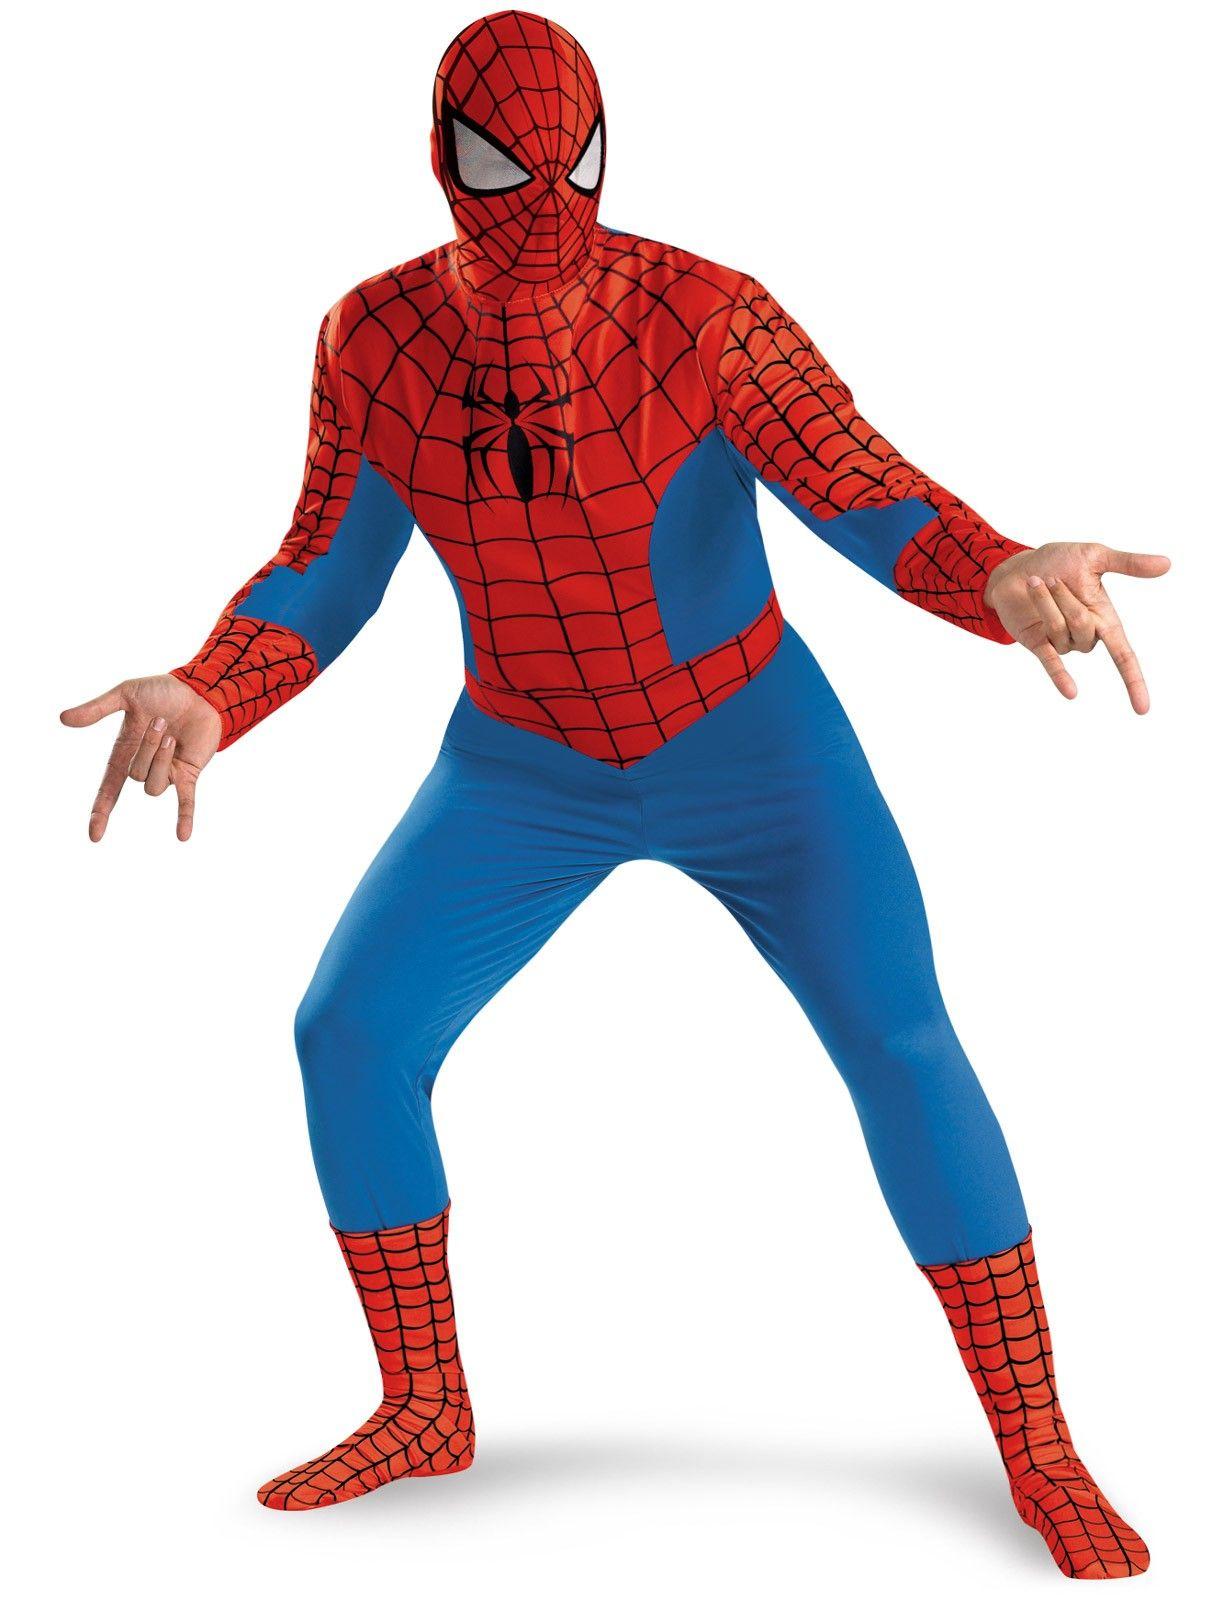 SpiderMan Deluxe Adult Men/'s Mask Disguise Cosplay Hood Costume Halloween Toy